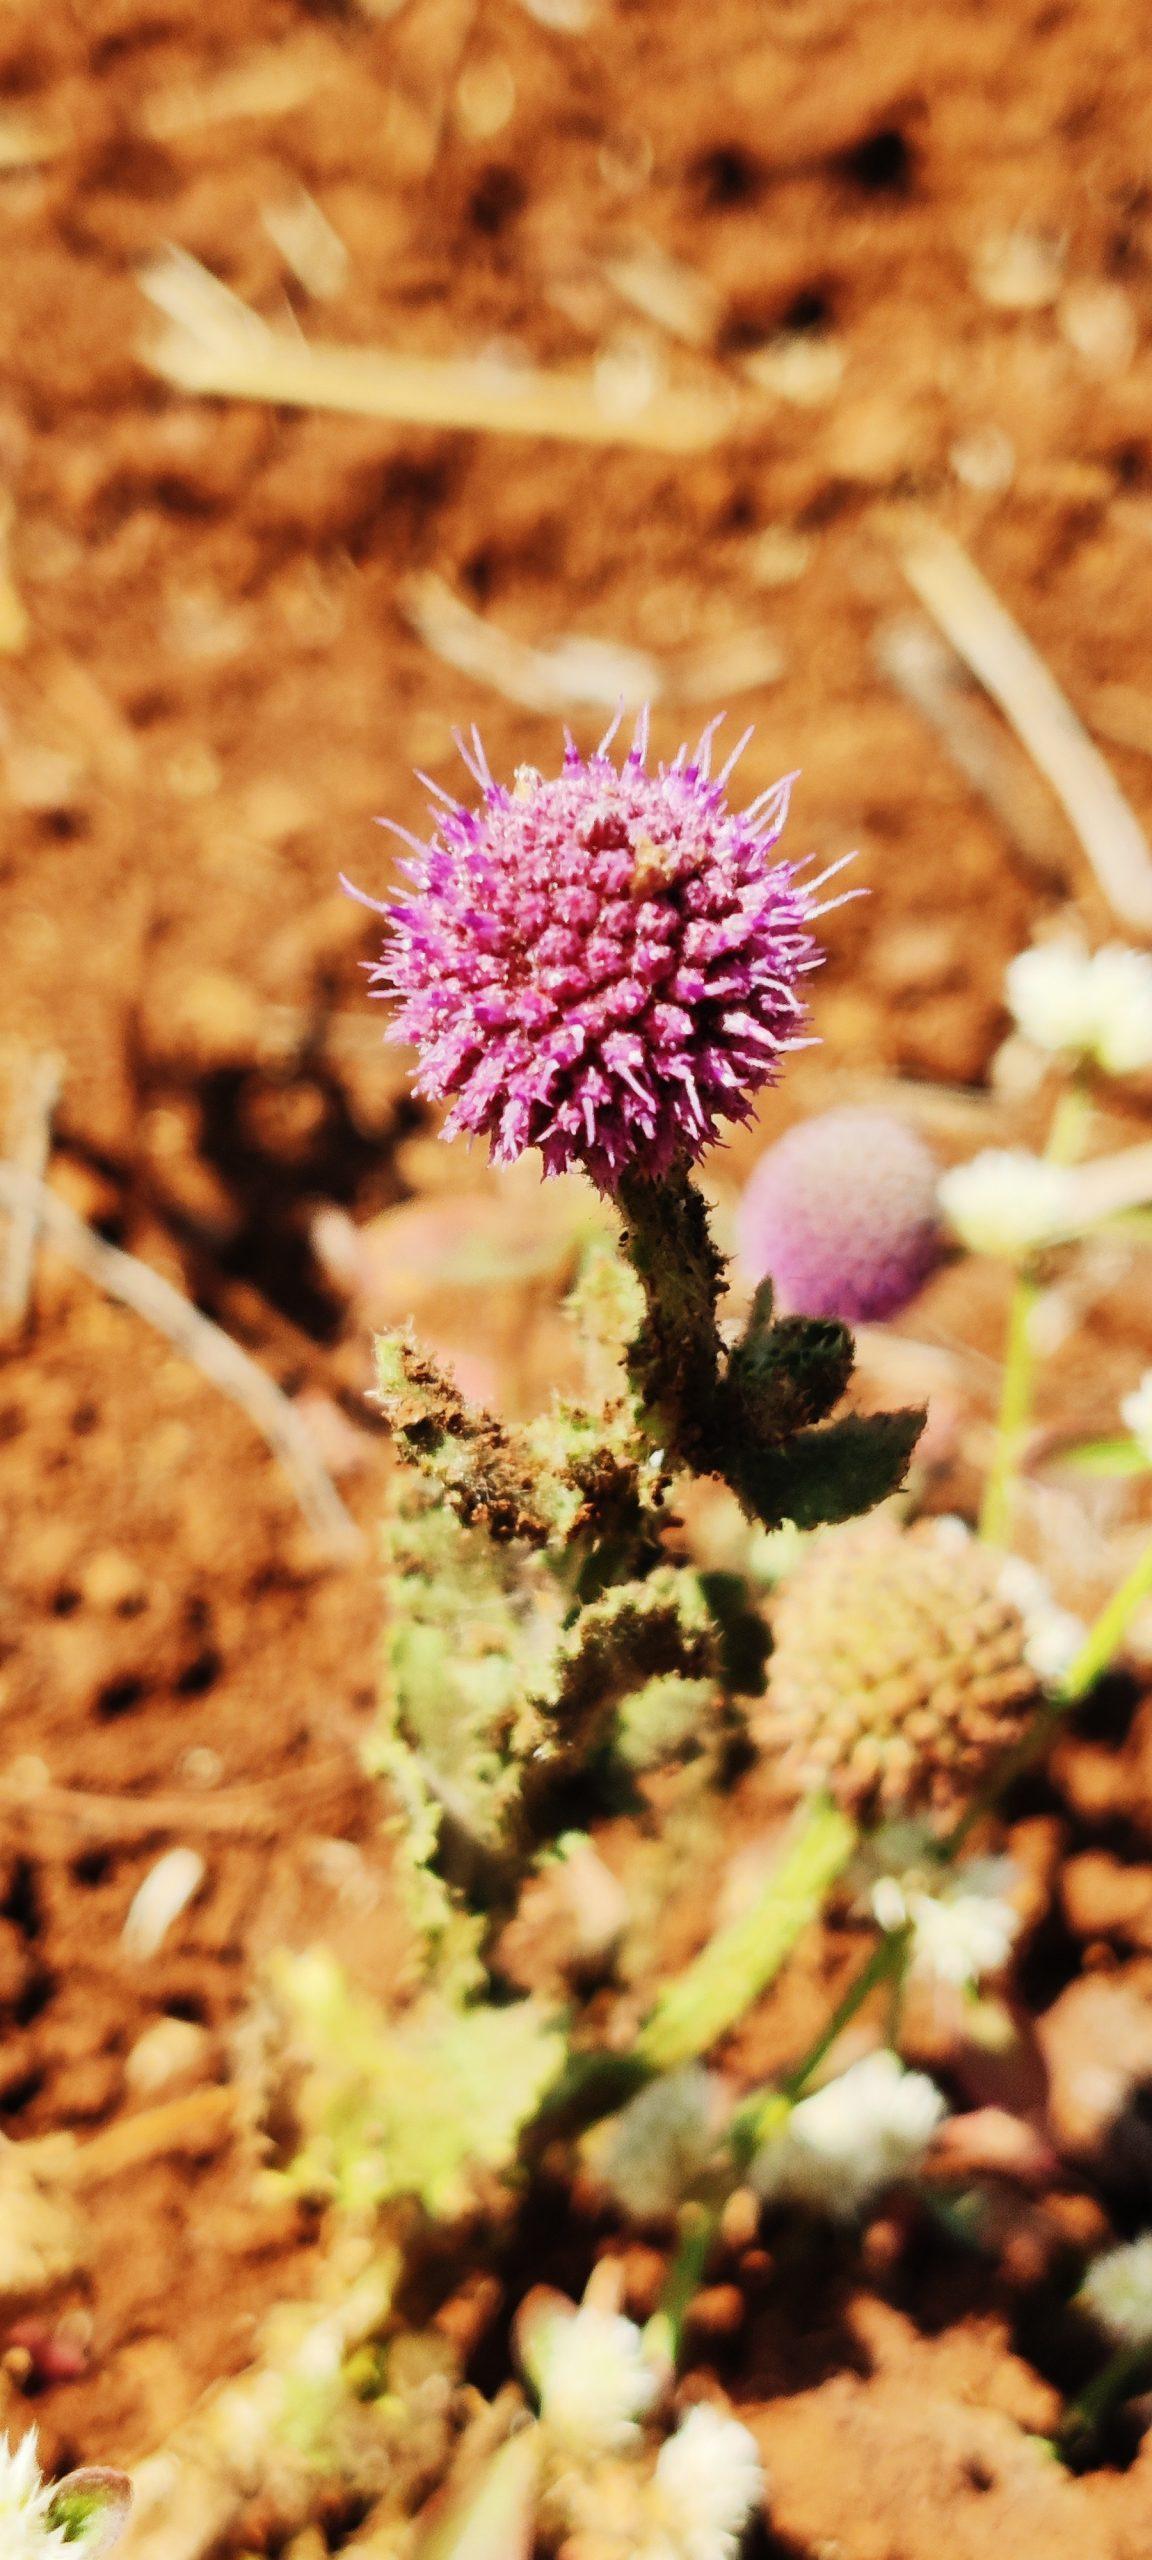 Tiny flower on plant